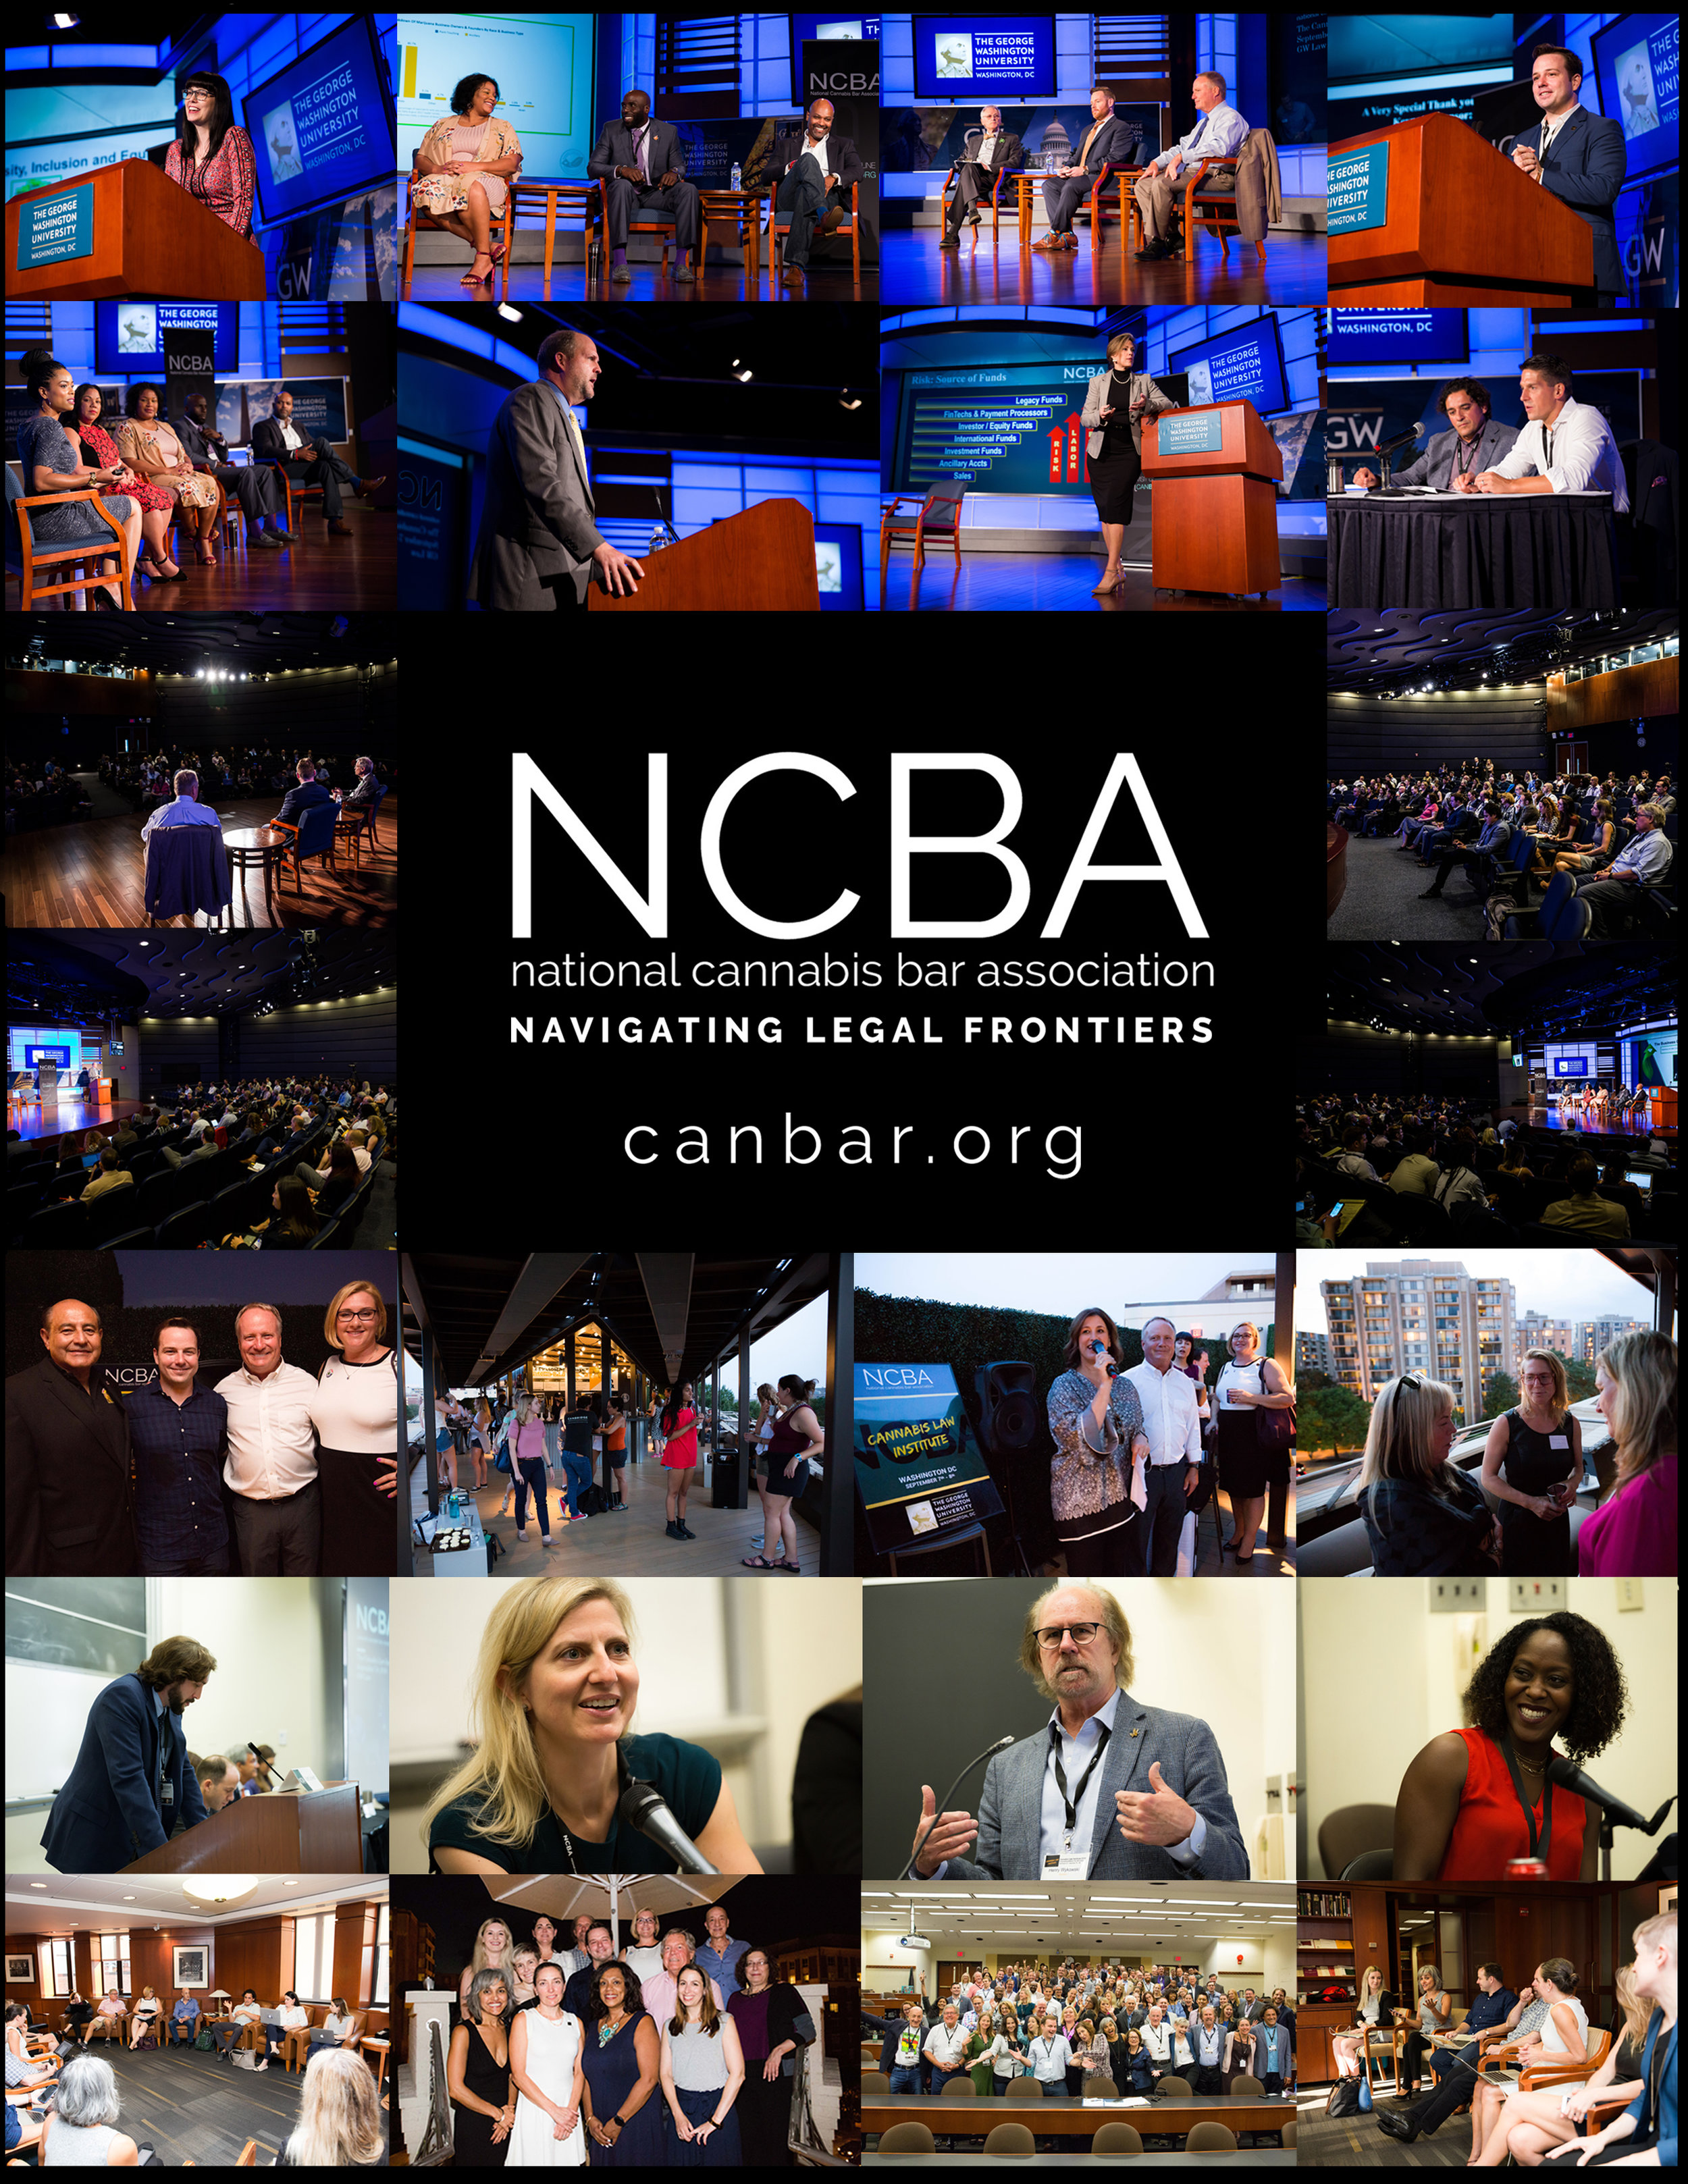 NCBA Full Page v3.4 9.26.jpg